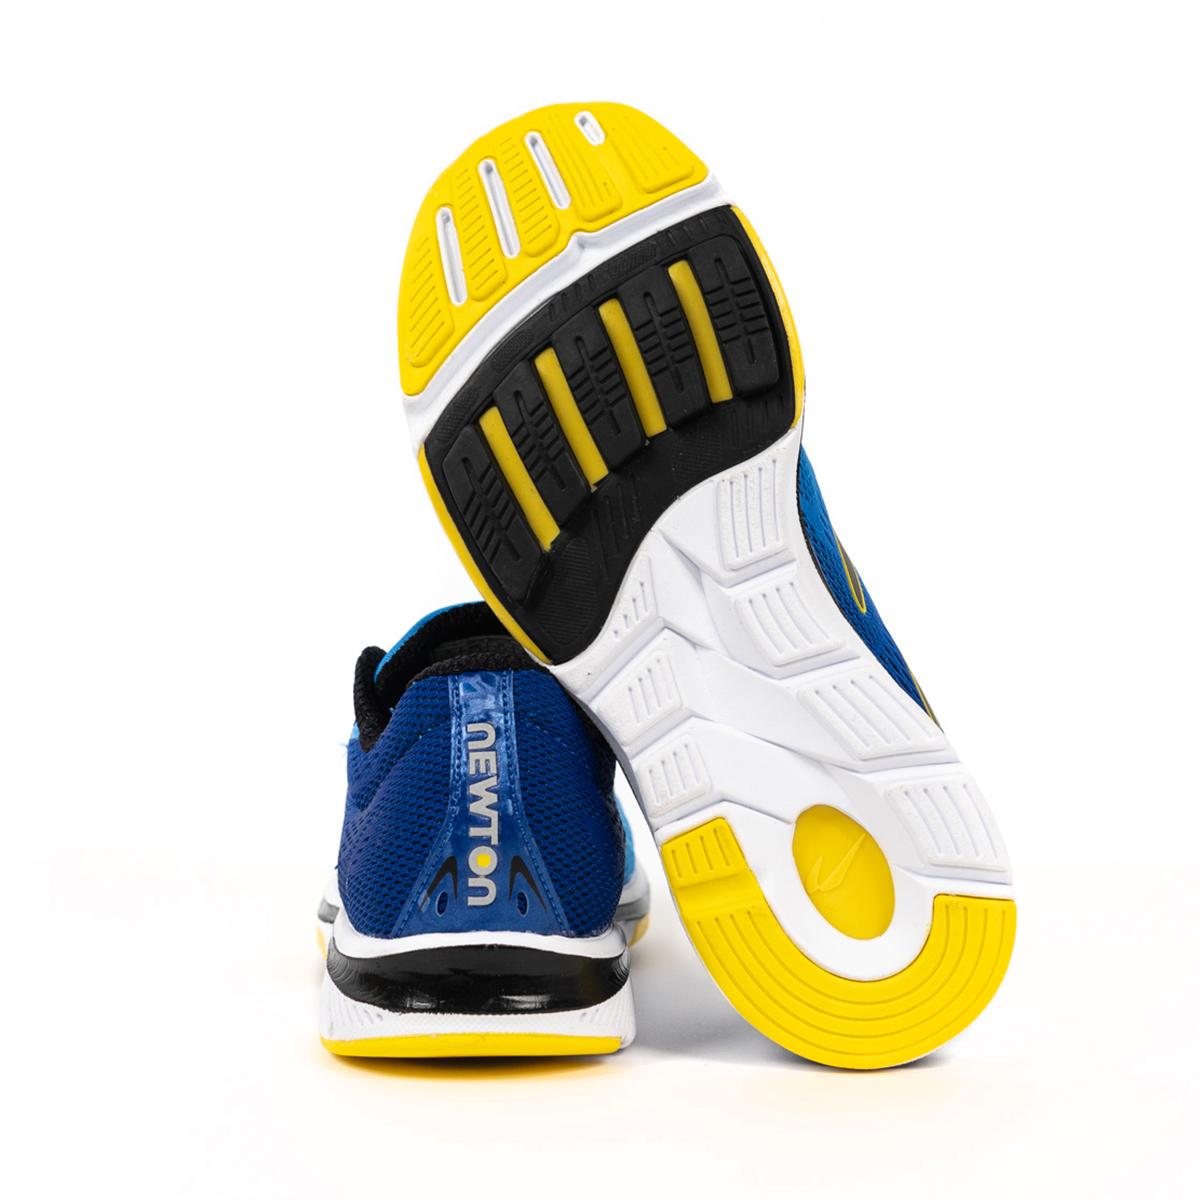 Men's Newton Gravity 9 Running Shoe - Color: Navy/Citron (Regular Width) - Size: 6, Navy/Citron, large, image 2